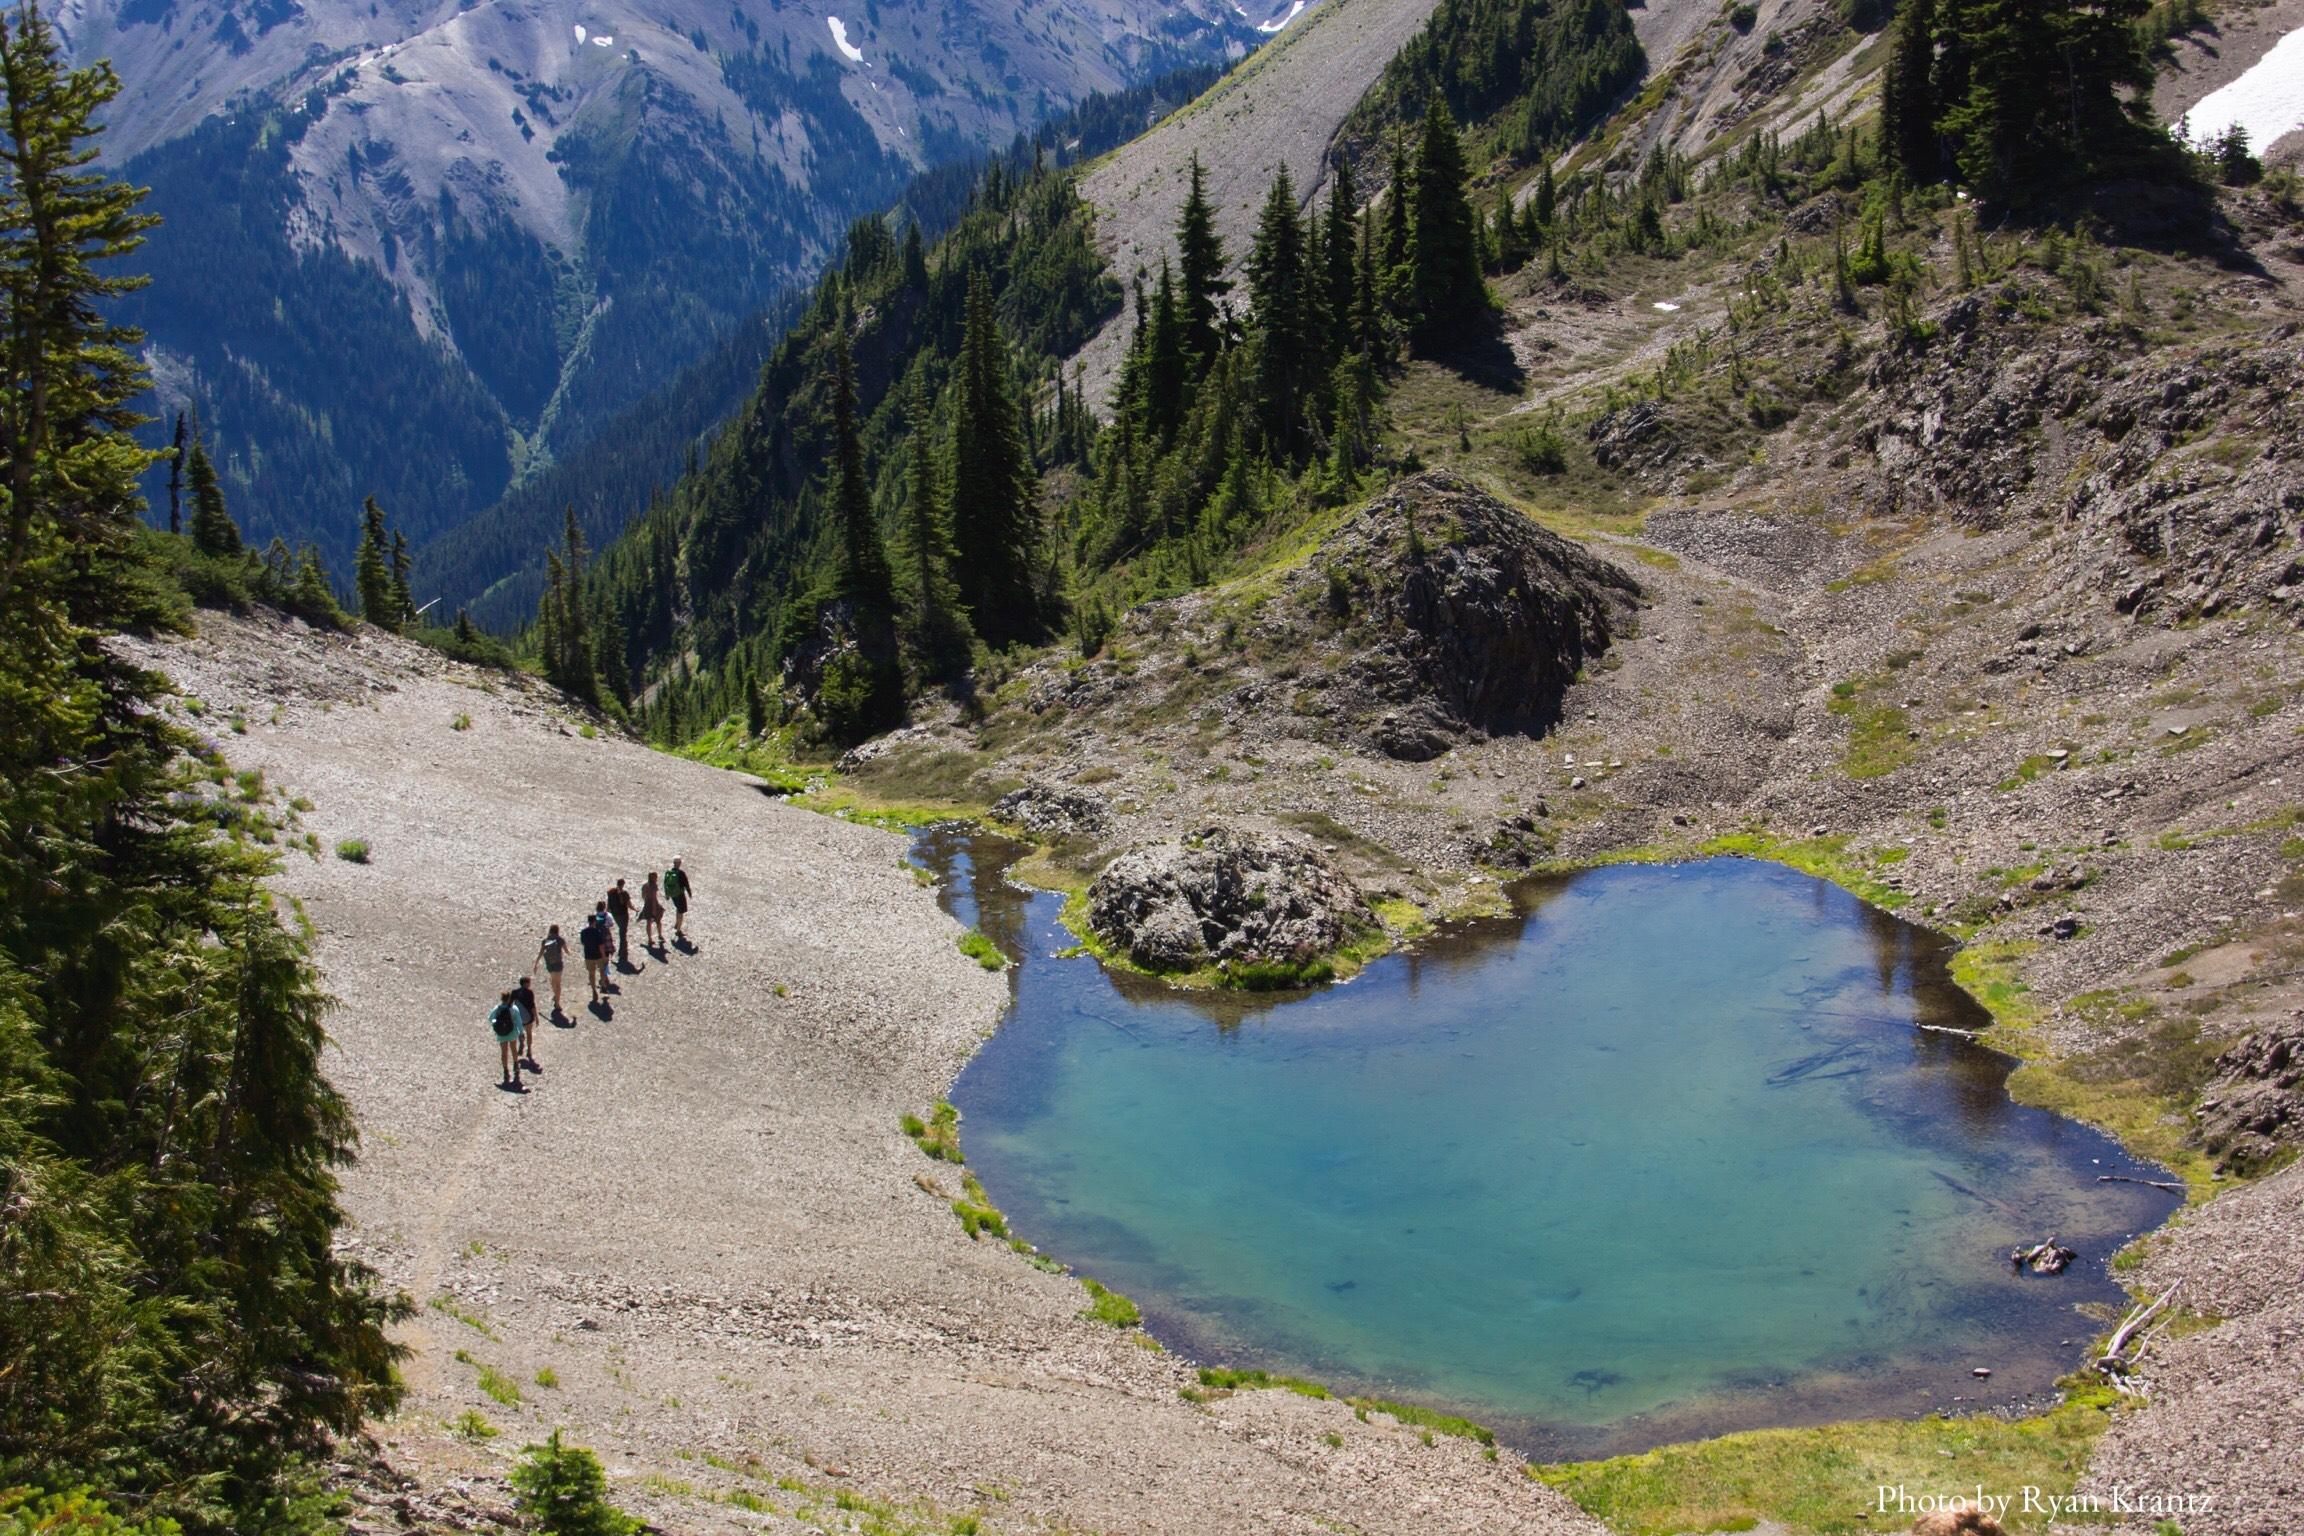 RyanKrantz_AlpineEcology_OlympicNationalPark2.jpg